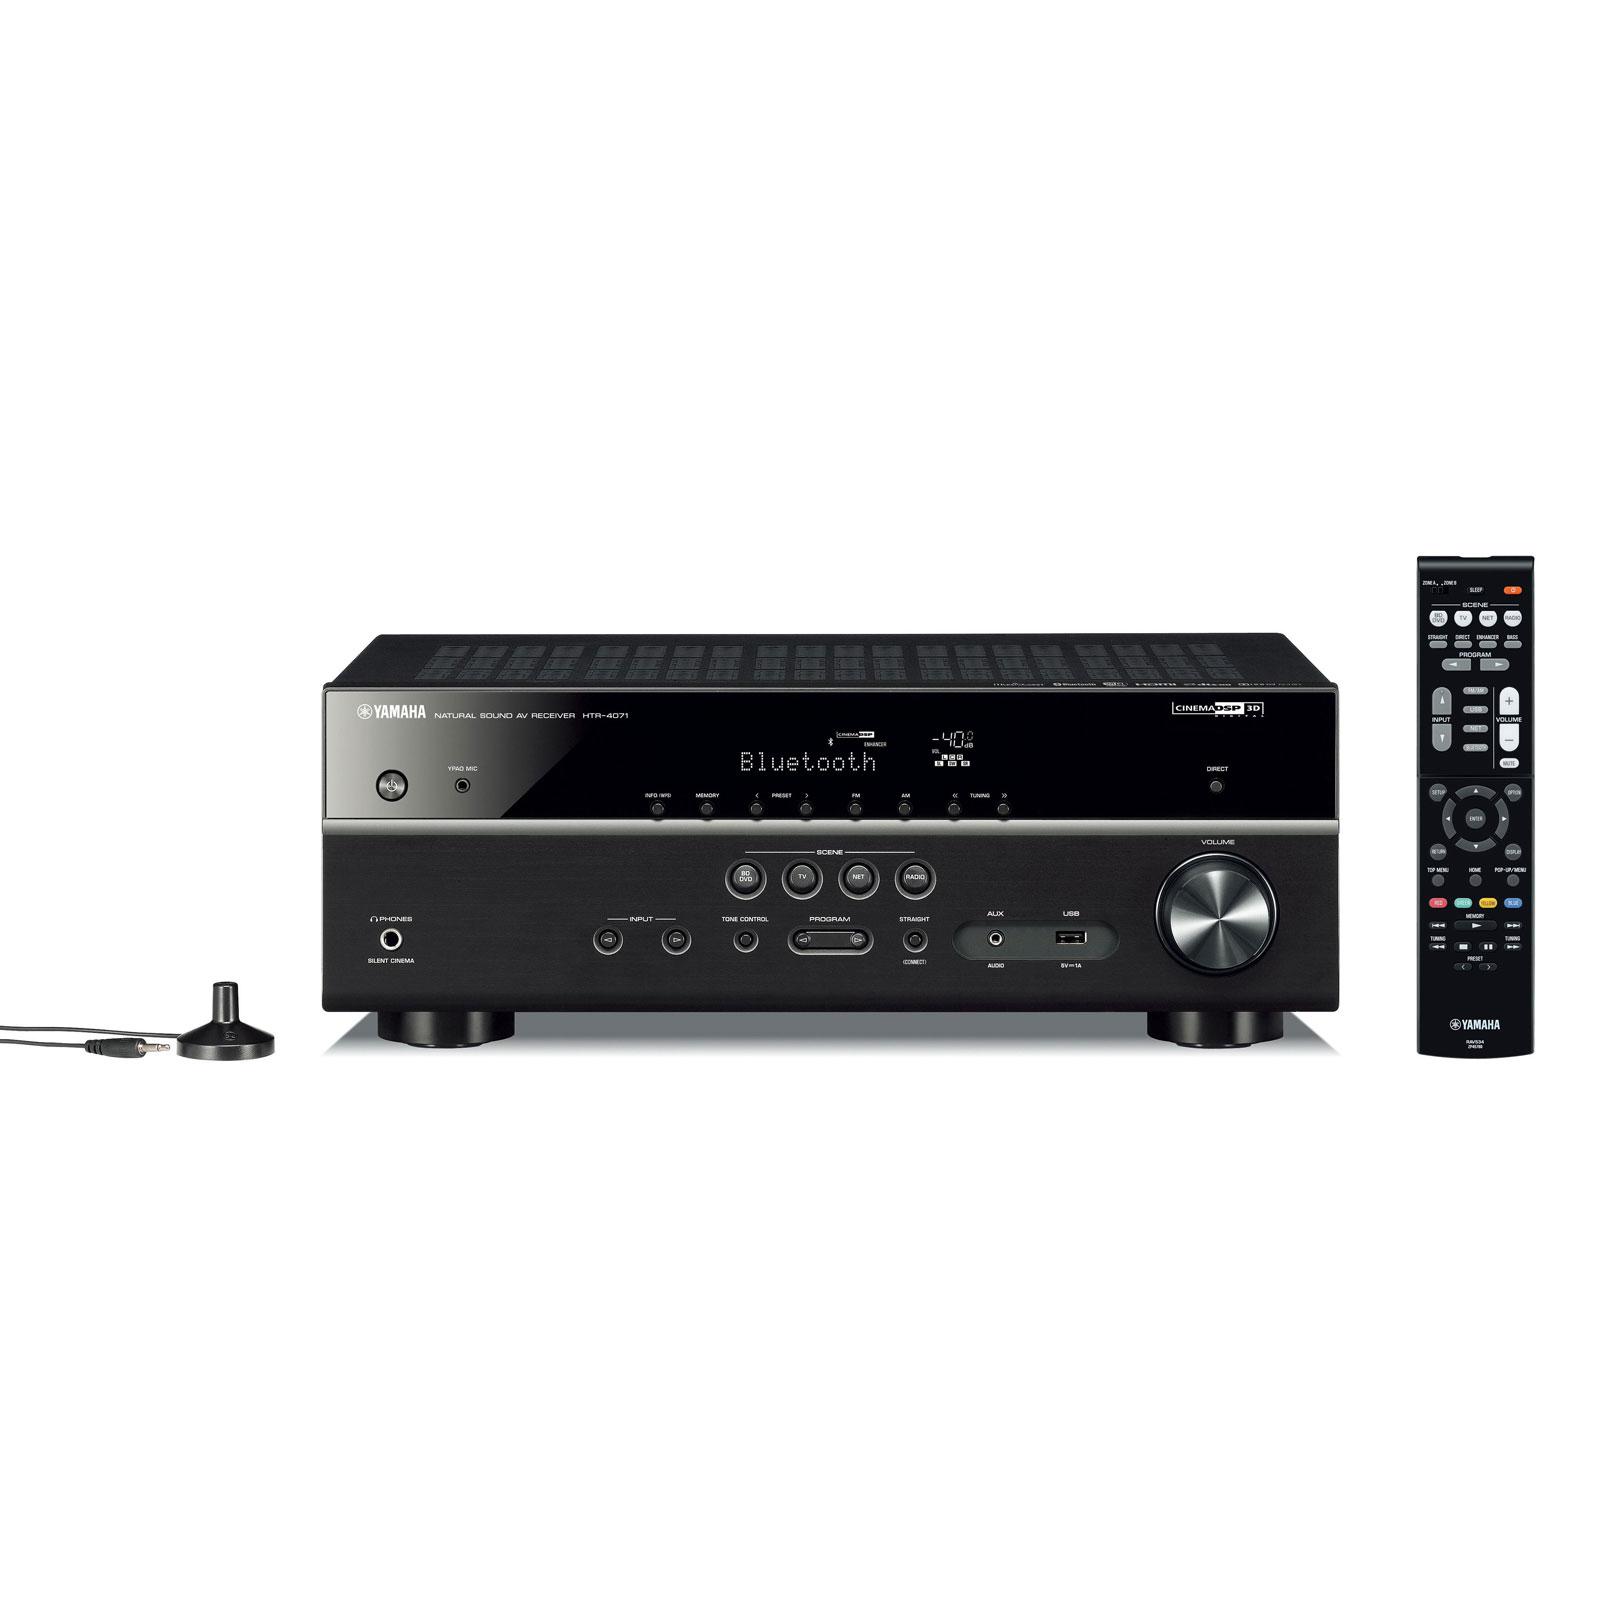 Ampli home cinéma Yamaha HTR-4071 Noir Ampli-tuner Home Cinéma 5.1 3D-Ready avec HDMI 2.0, HDCP 2.2, Ultra HD 4K, Wi-Fi, Bluetooth, DLNA, AirPlay et MusicCast